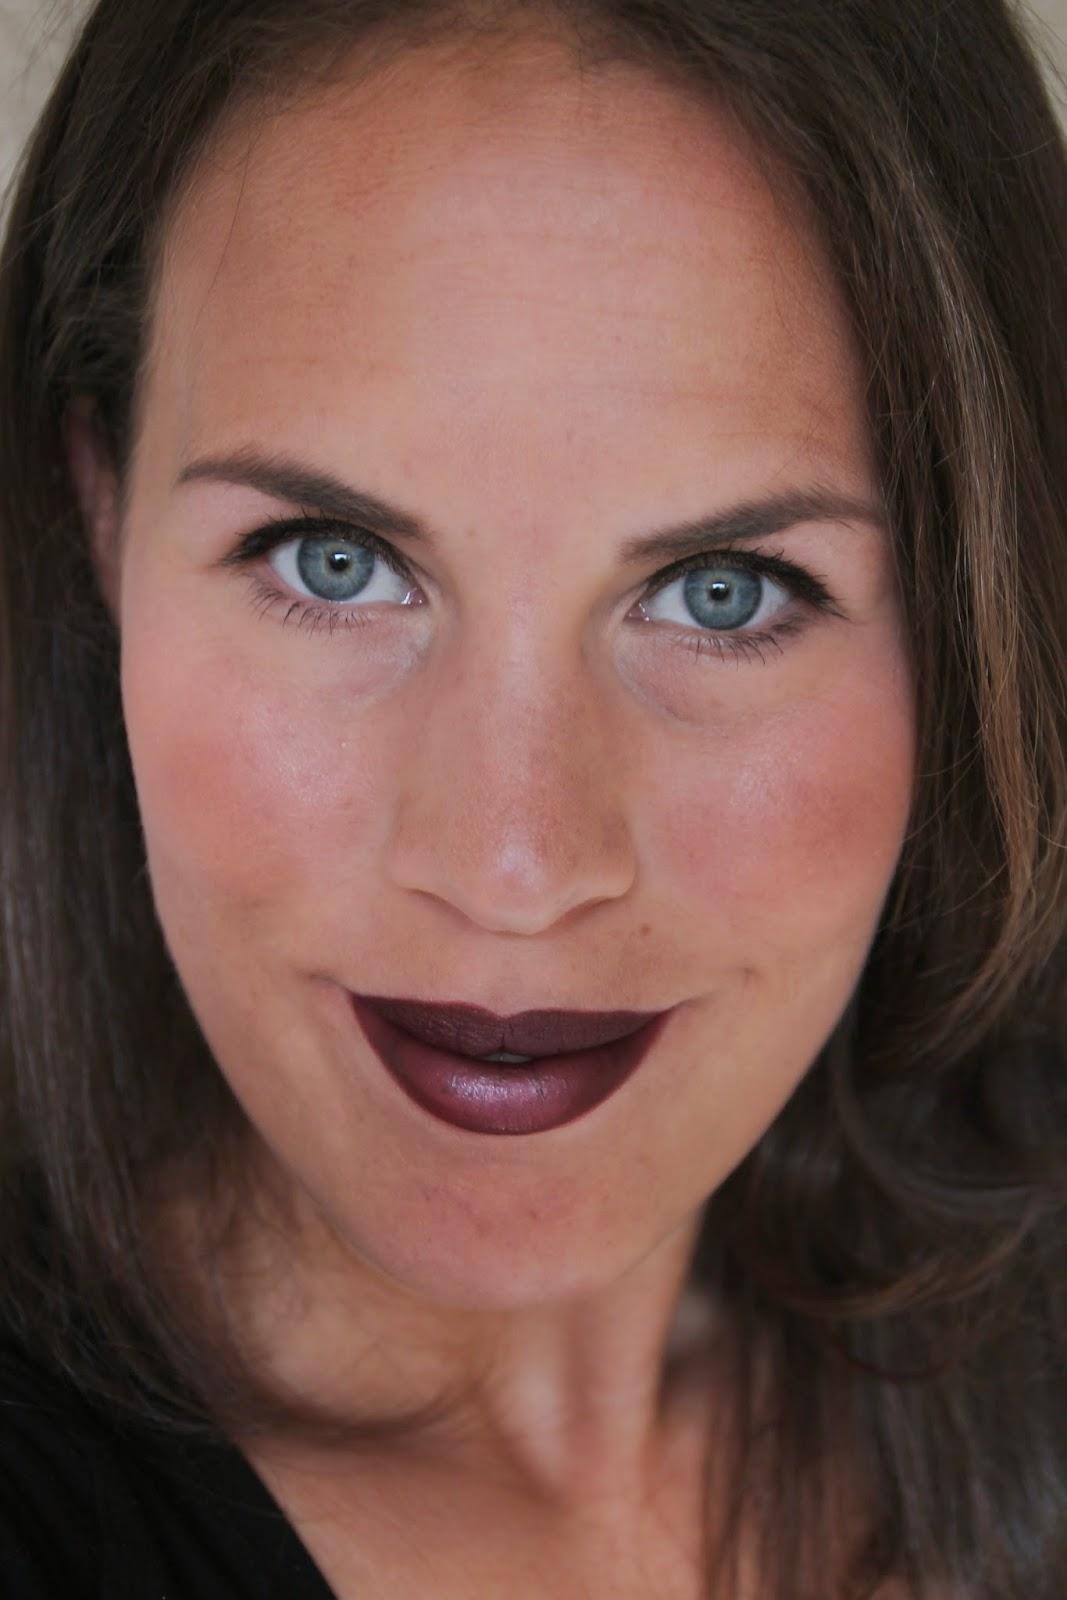 Crystaliciousss Mac Hailey Williams Lipstick Sounds Like: Crystaliciousss: MAC A Novel Romance: Lingering Kiss